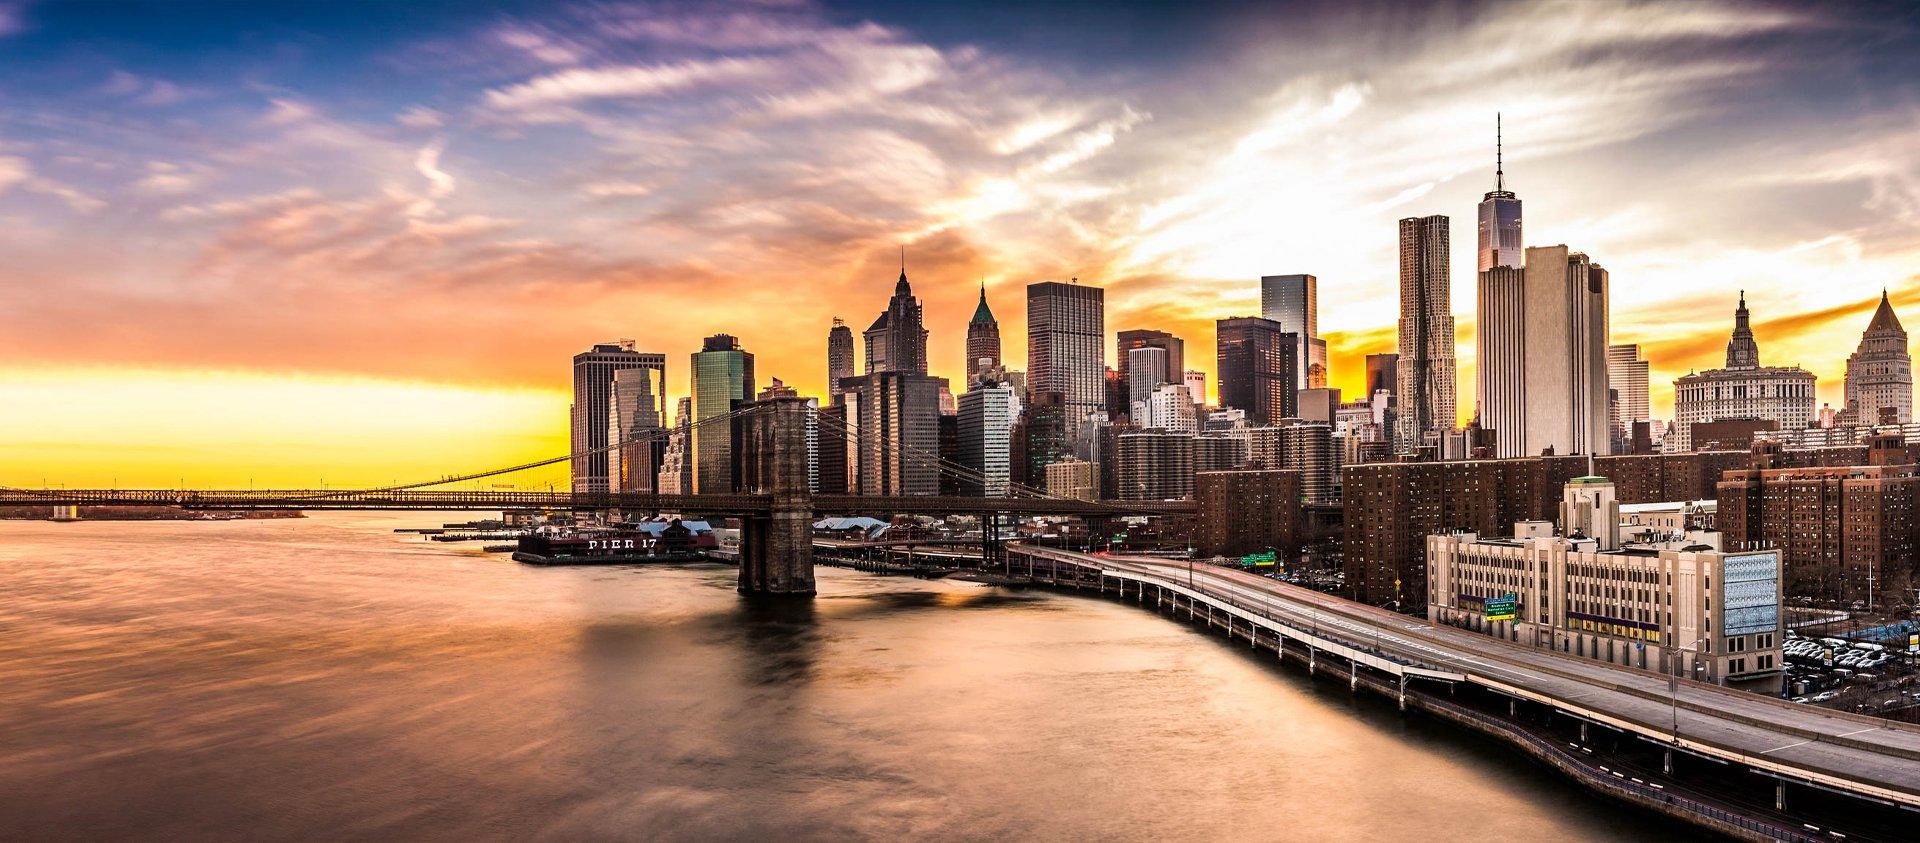 BSP - Your Netsuite 5-Star Partner In New York